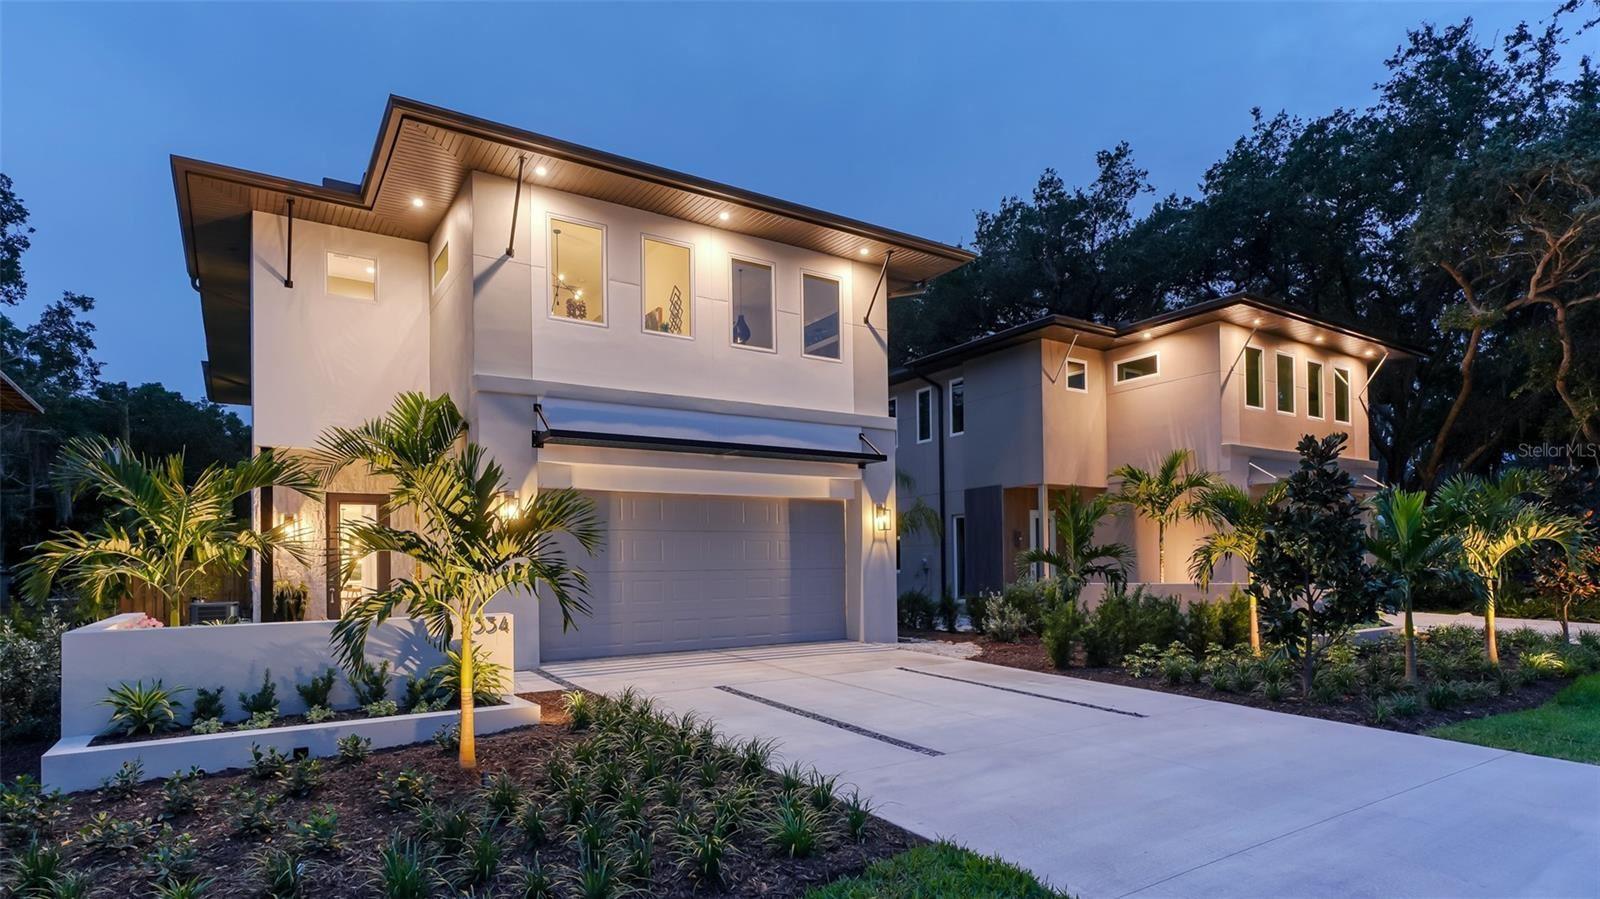 Photo of 2334 FLORINDA STREET, SARASOTA, FL 34231 (MLS # A4512678)